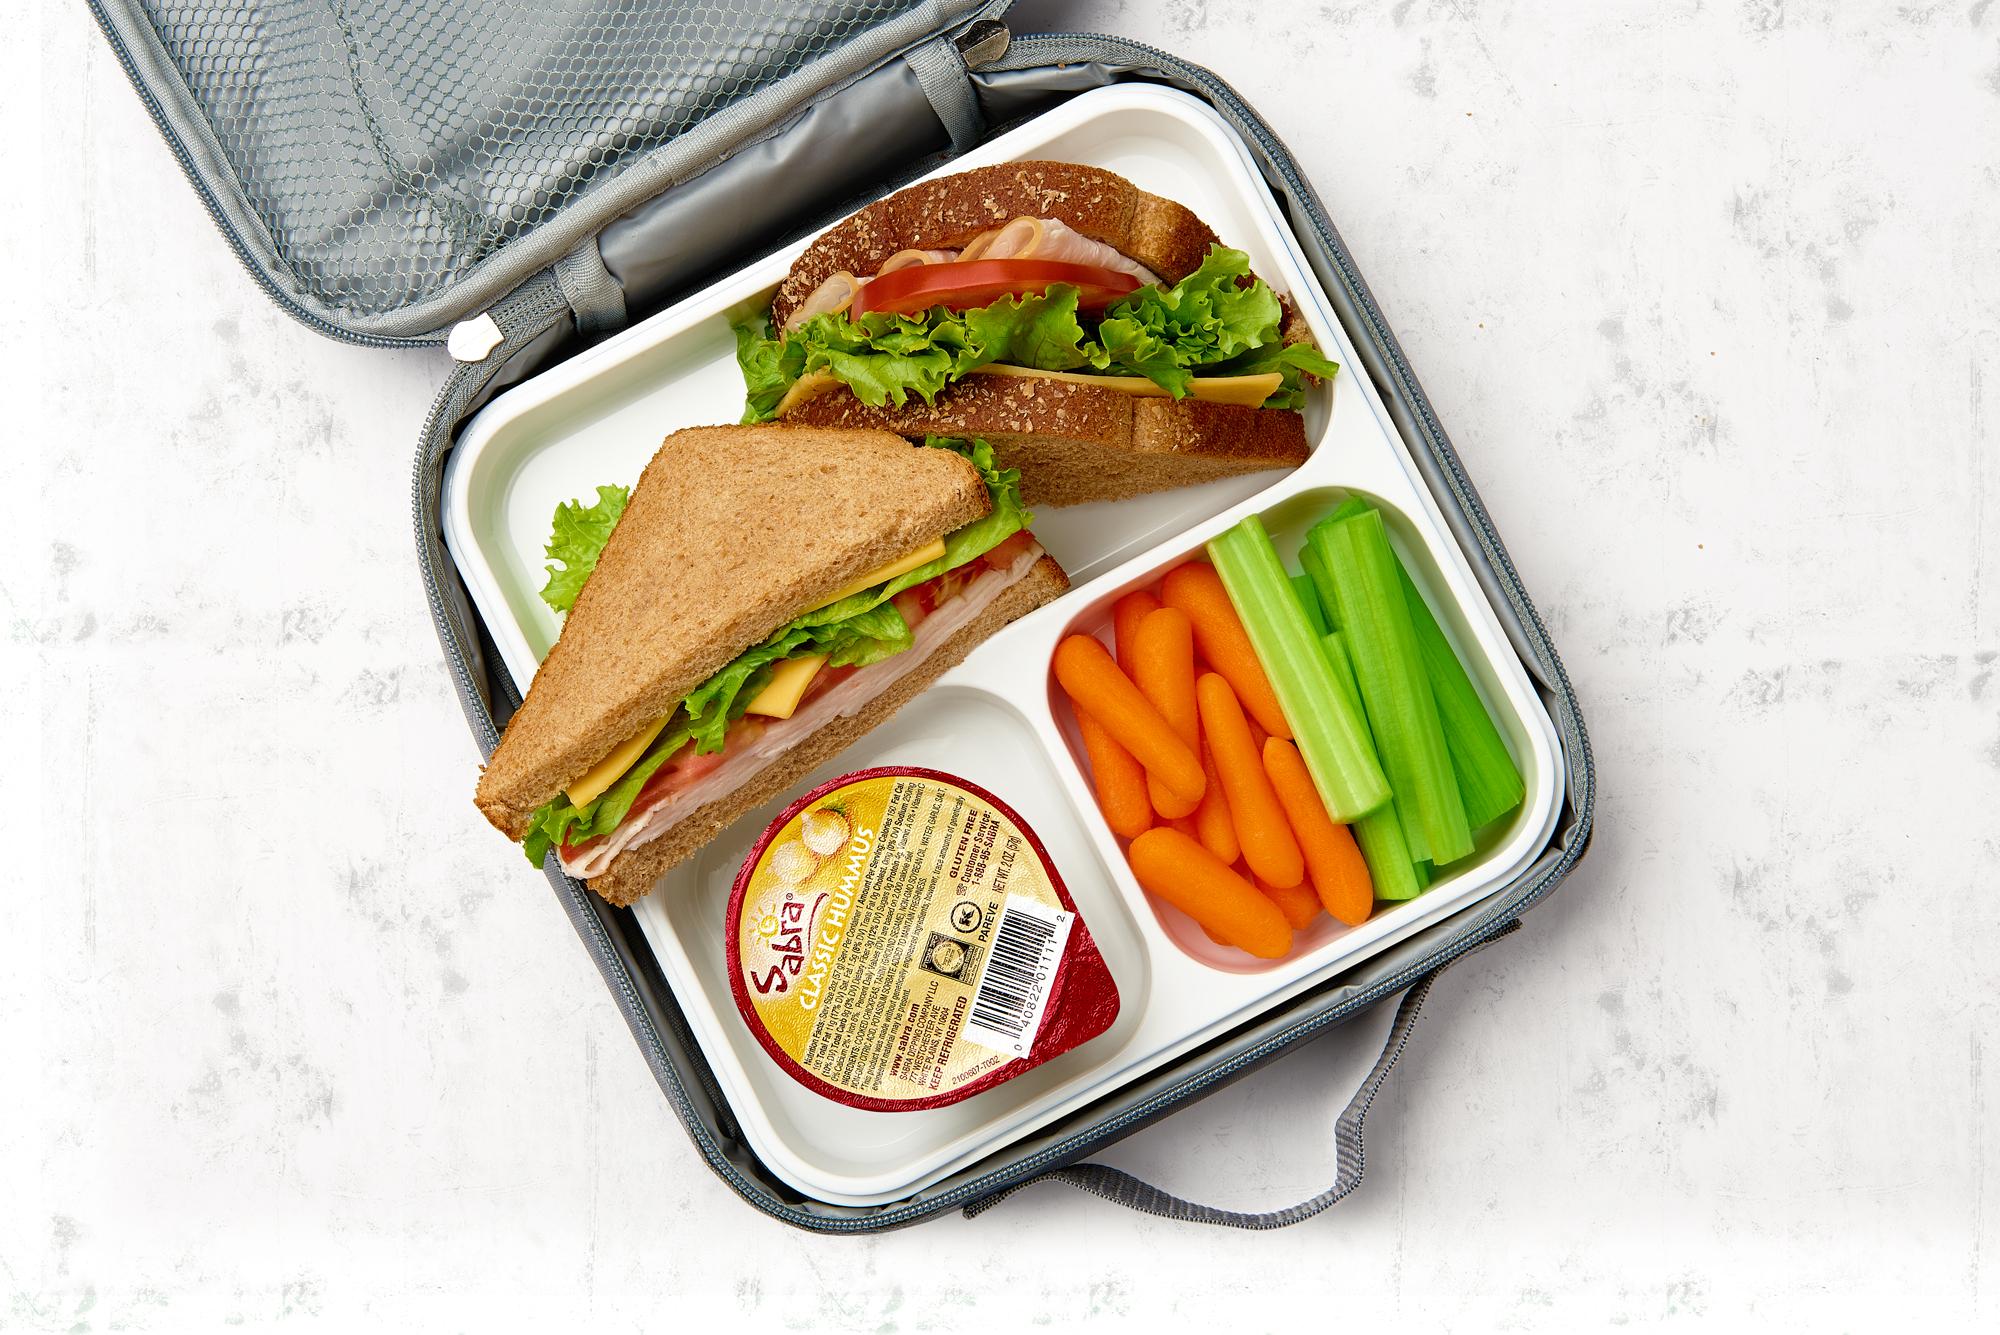 Sabra Go Back-to-School Hummus Pack Shot